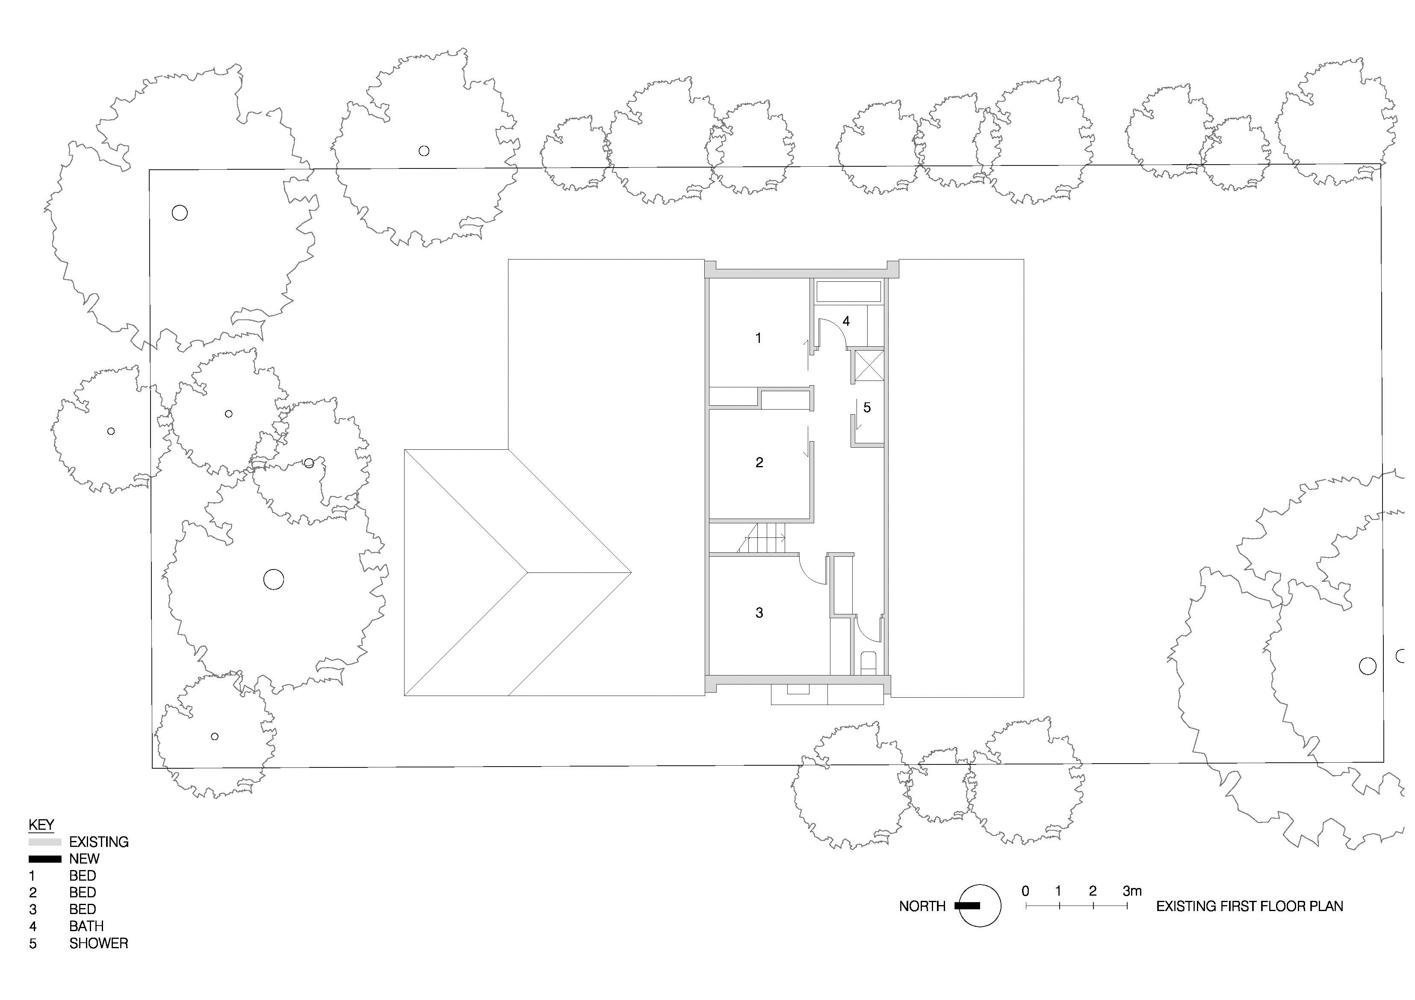 ruffey-lake-house-inbetween-architecture-the-design-emotive-35.jpg